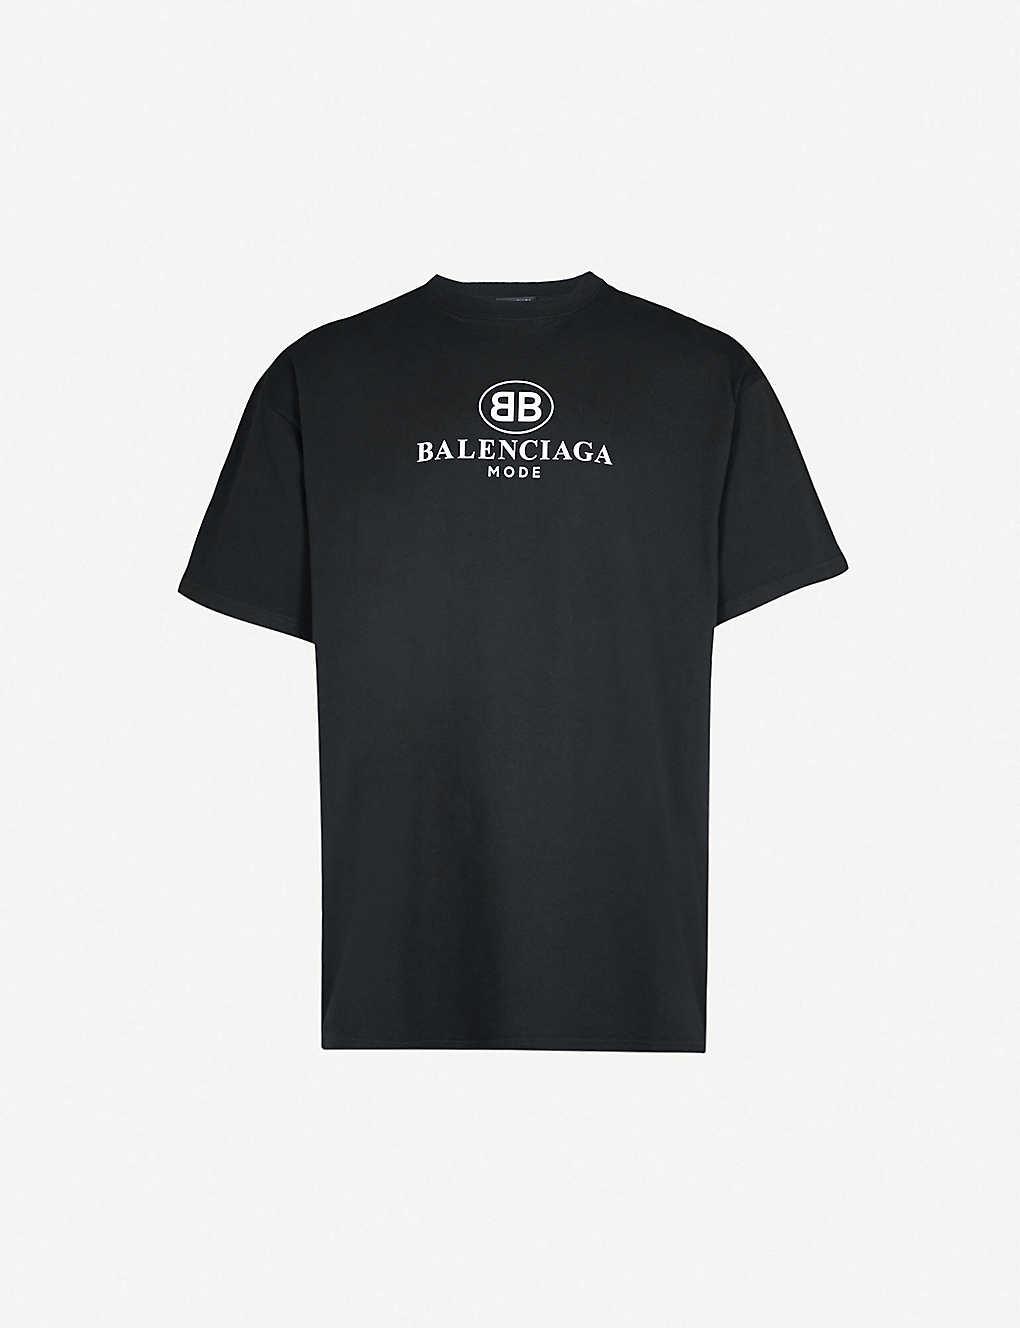 70fb83819501 BALENCIAGA - BB Mode-print cotton-jersey T-shirt | Selfridges.com